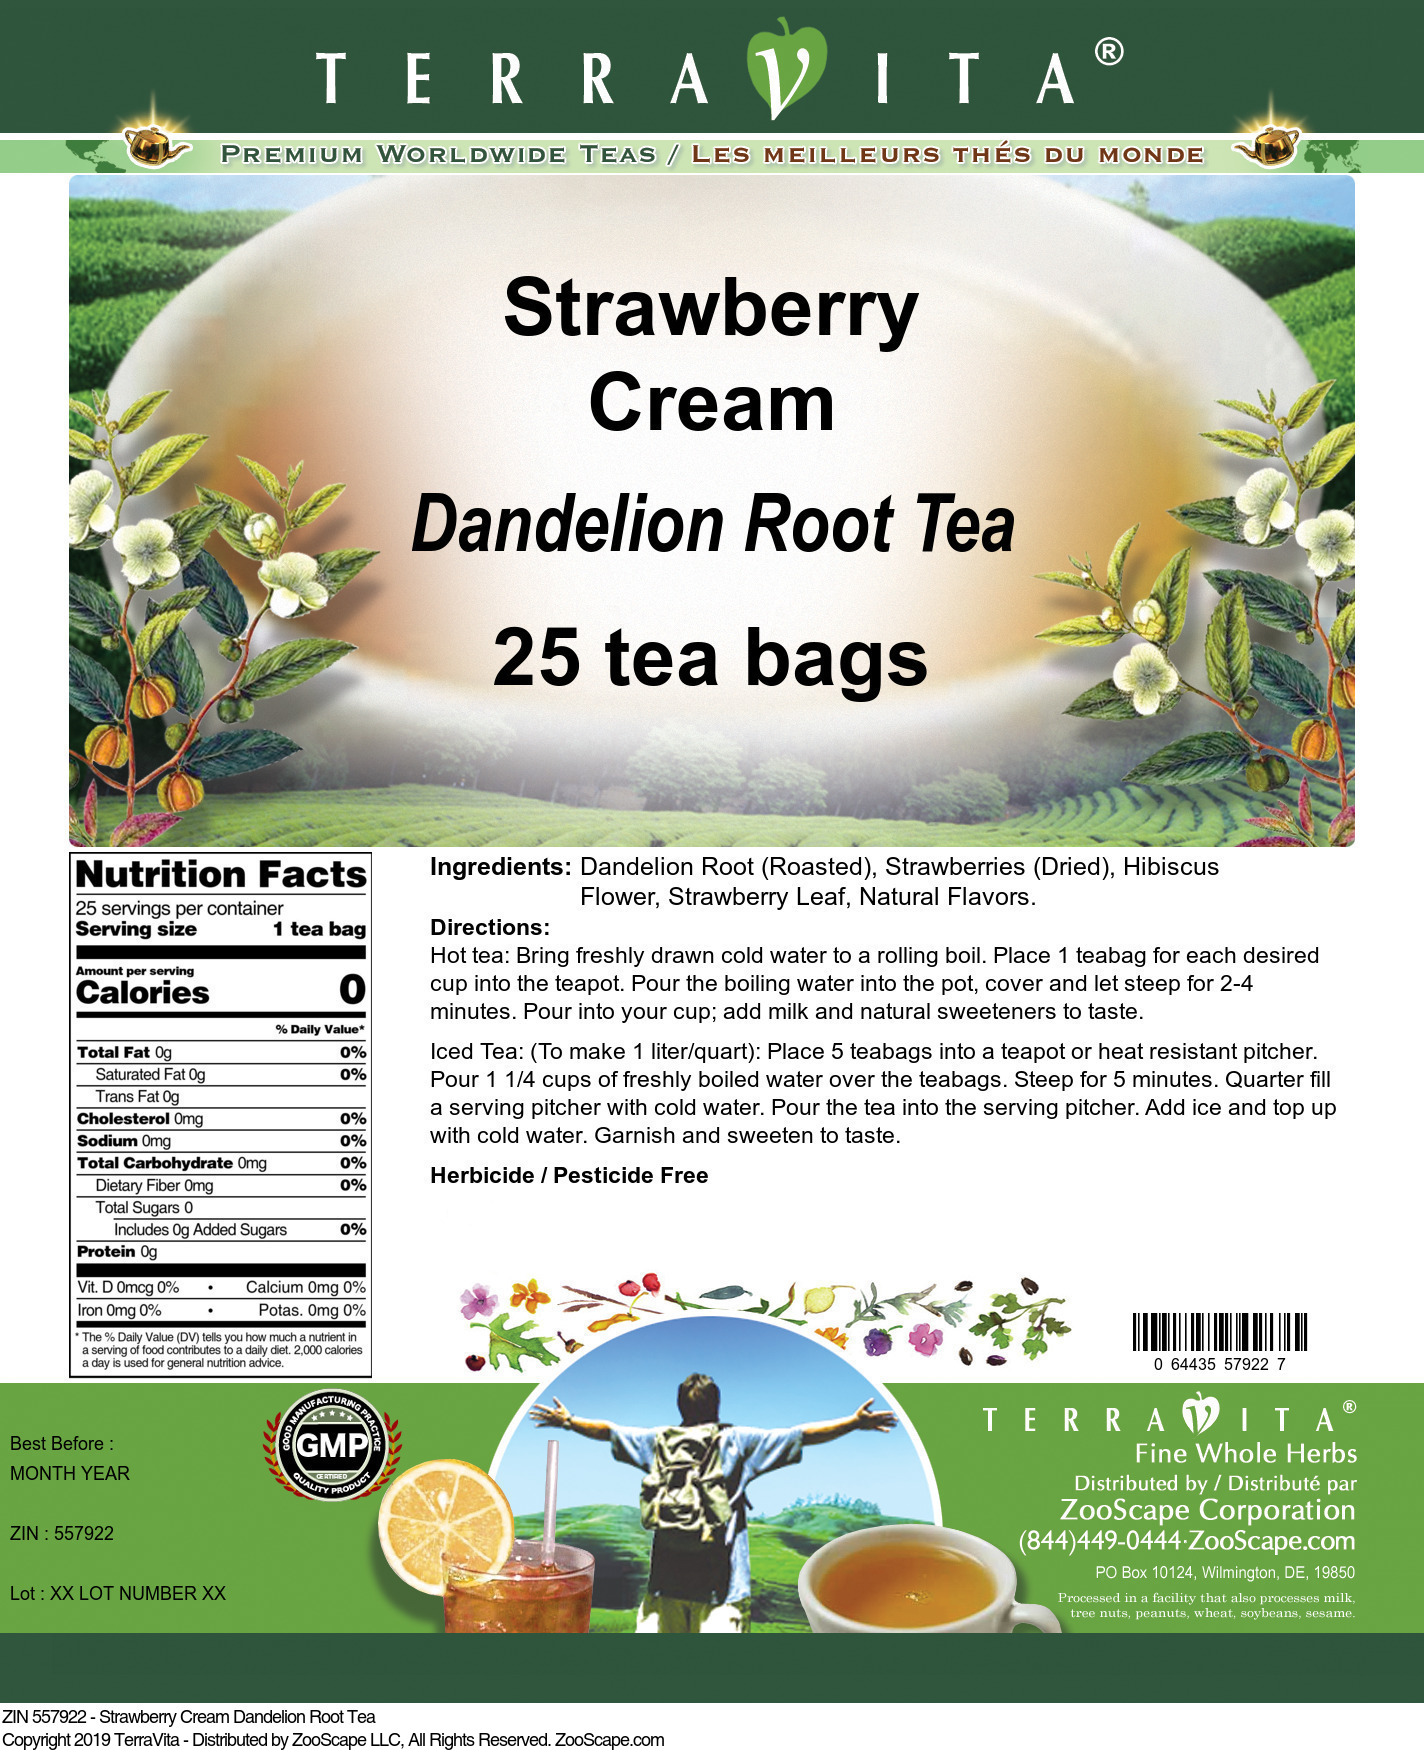 Strawberry Cream Dandelion Root Tea